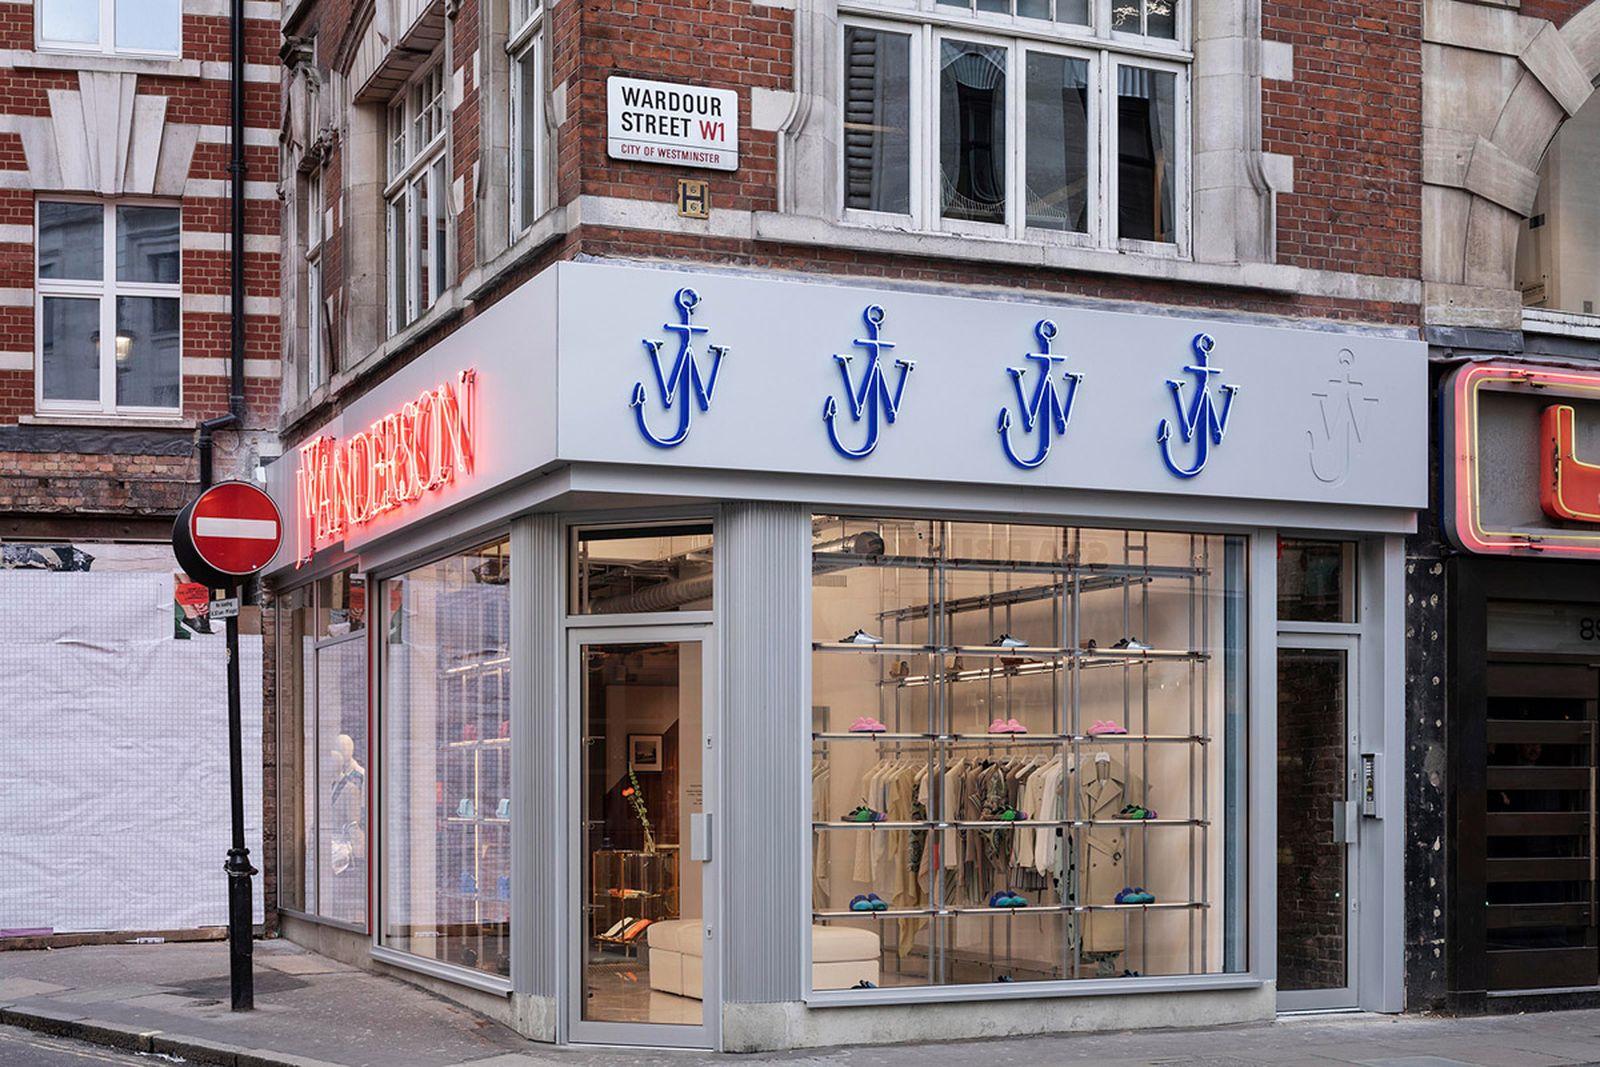 jw-jonathan-anderson-soho-london-uk-flagship-store-opening-2